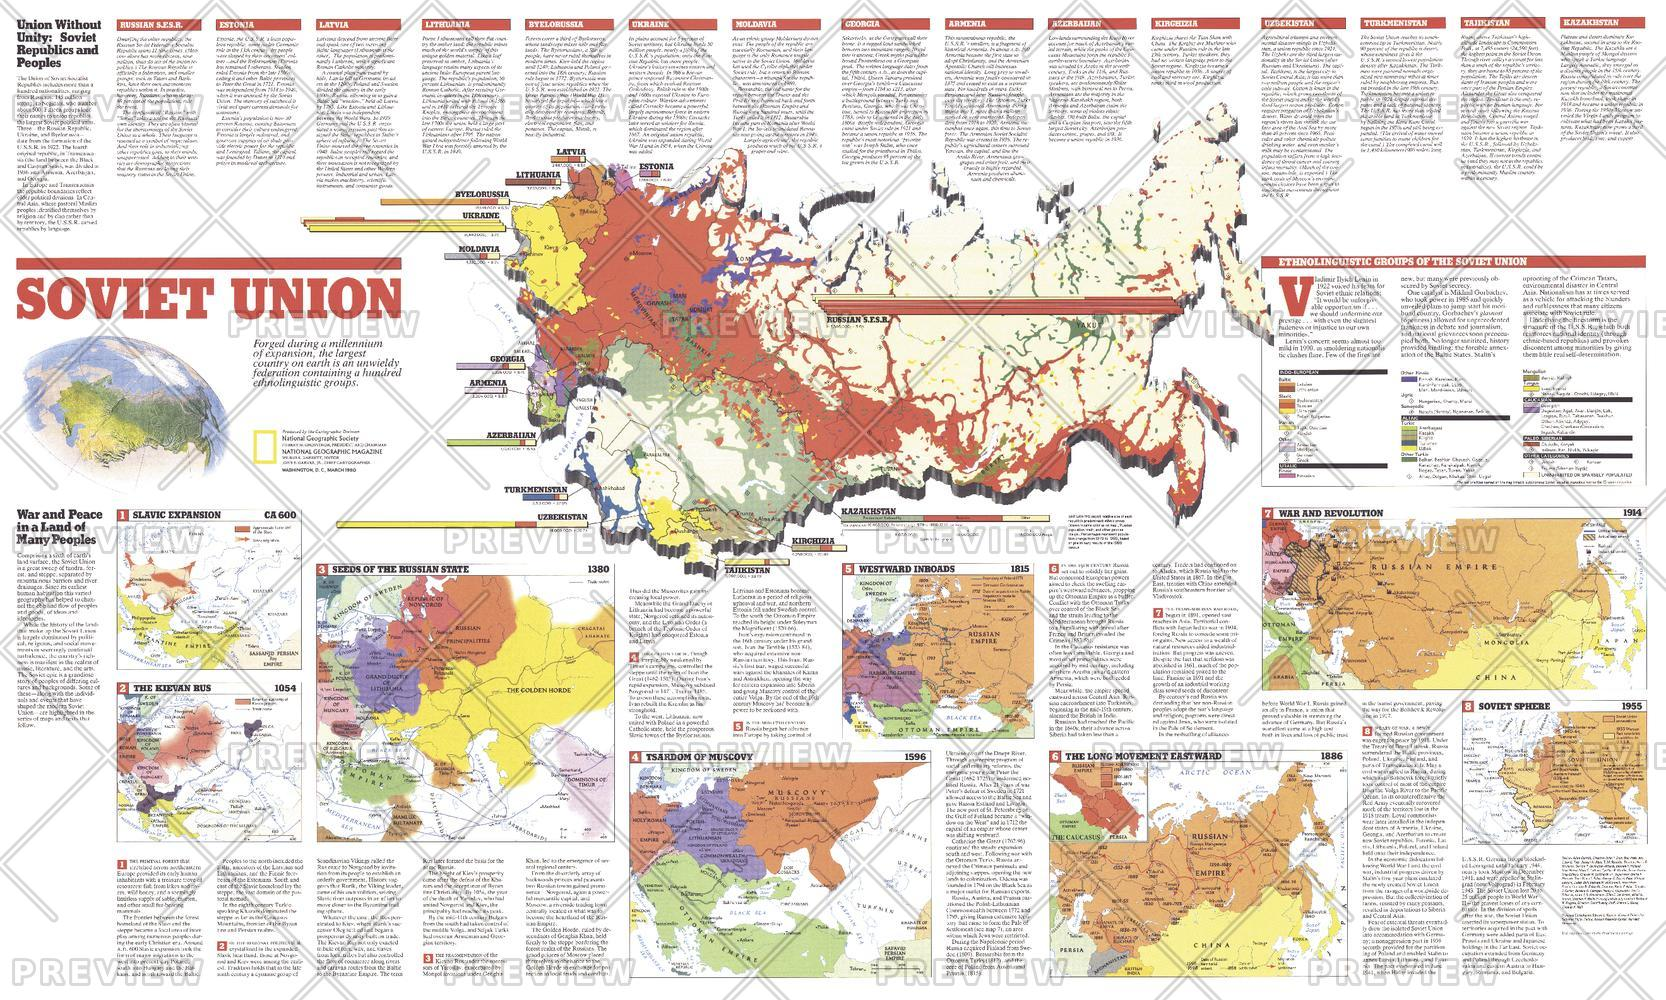 Soviet Union Theme  -  Published 1990